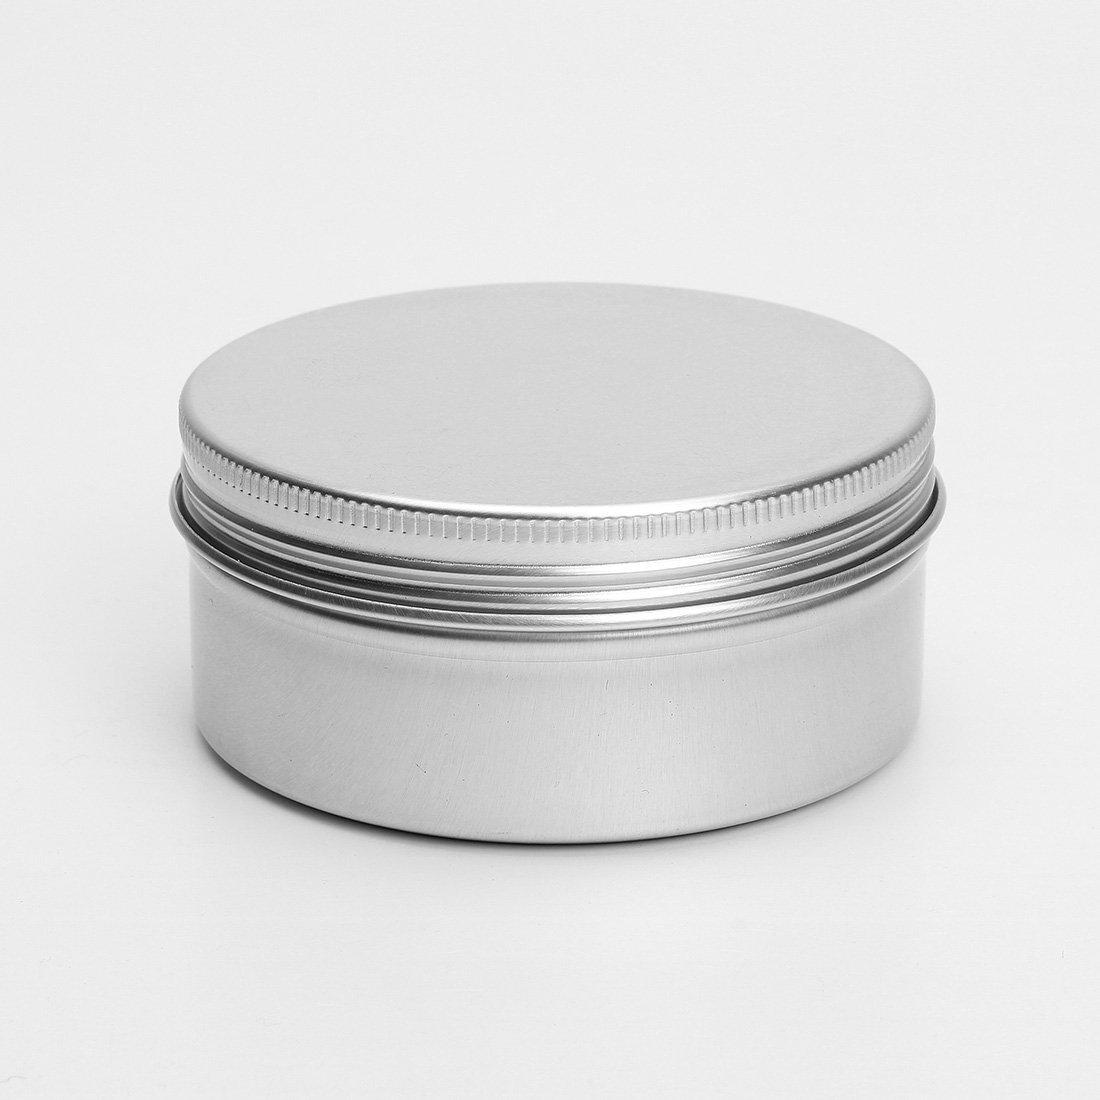 YOST-50PCS Aluminum Box Spice Box Balm Lip Balm Makeup box empty 50ml